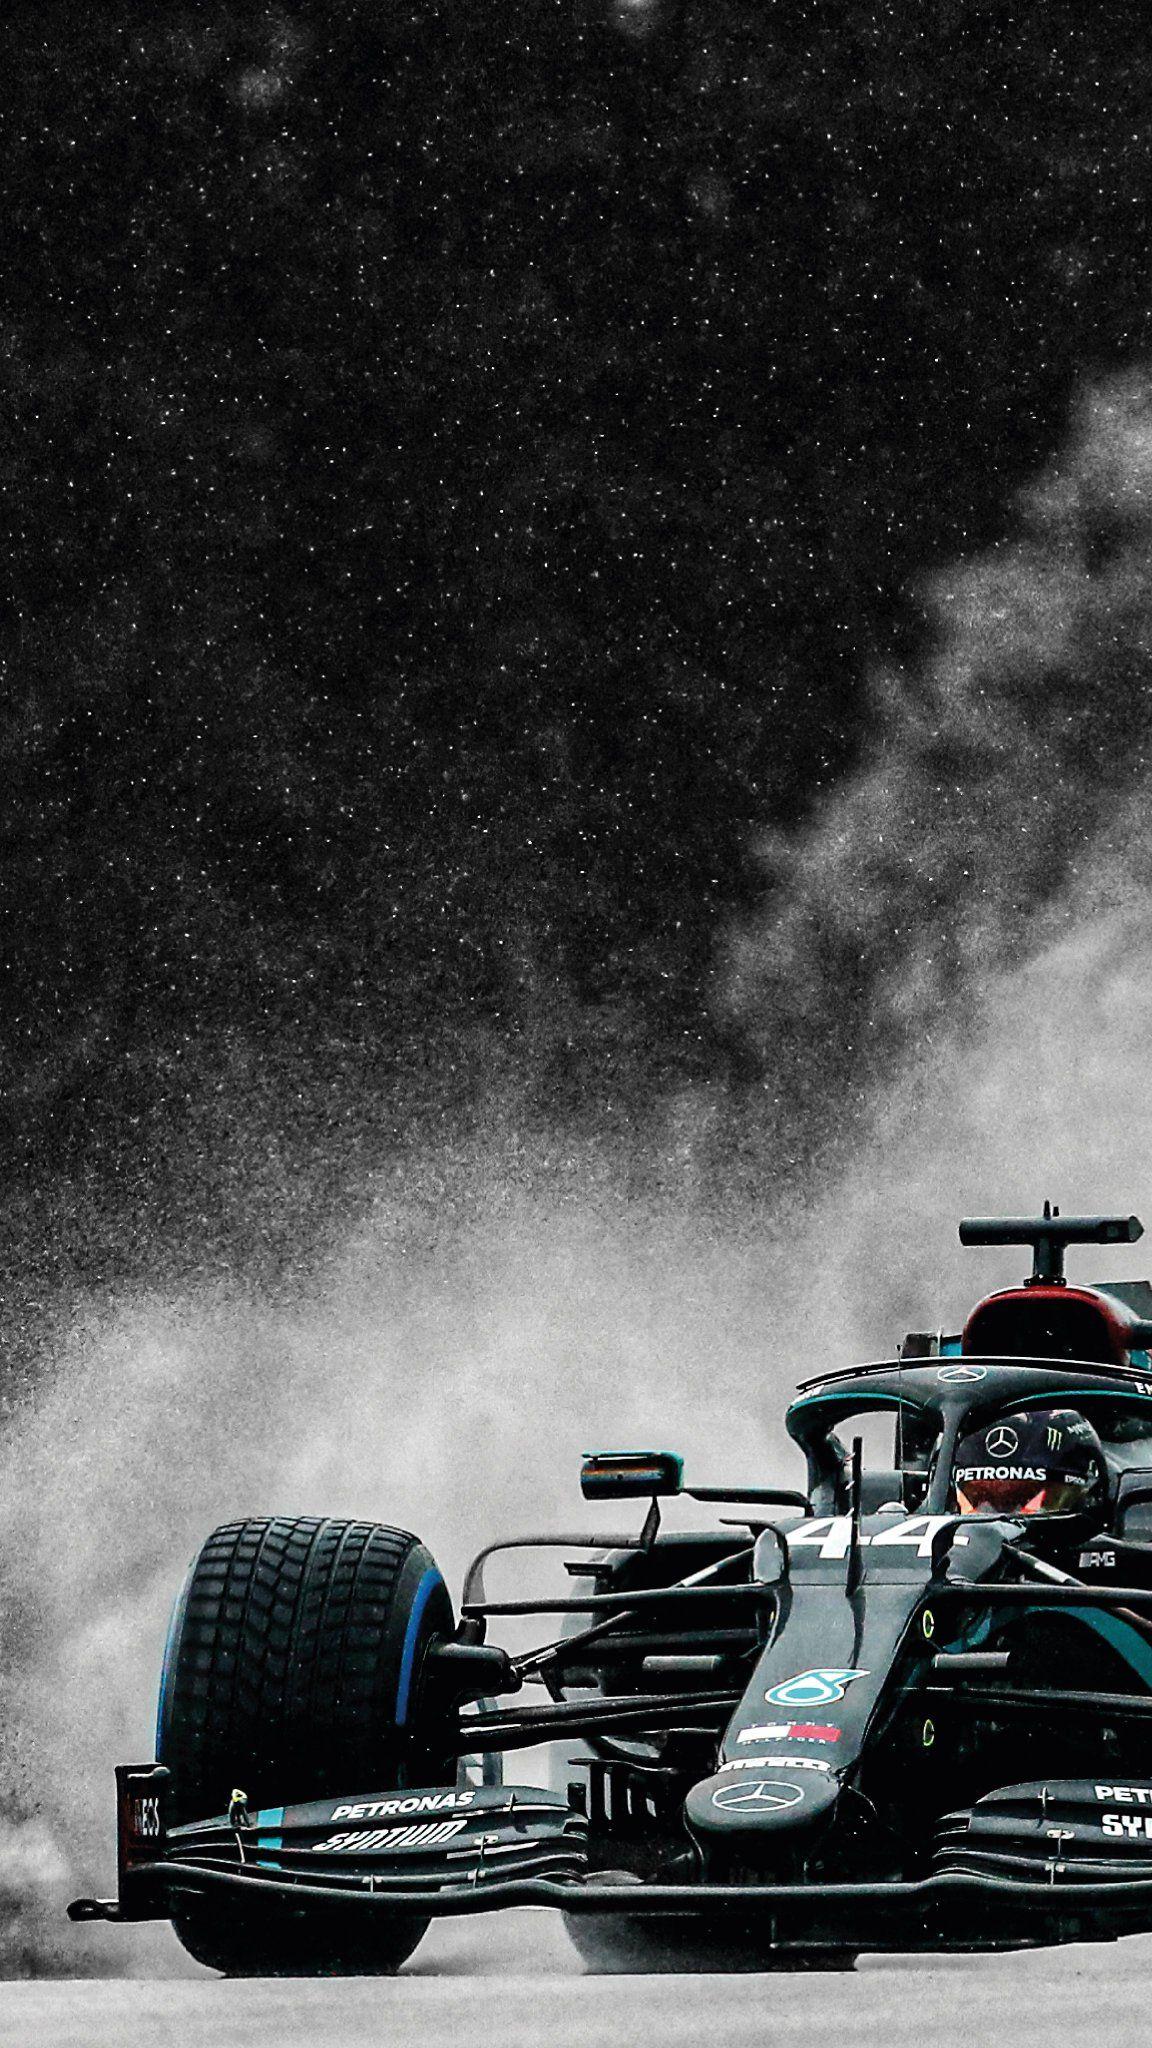 Mercedes Amg F1 On Twitter In 2020 Formula 1 Car Mclaren Formula 1 Formula Drift